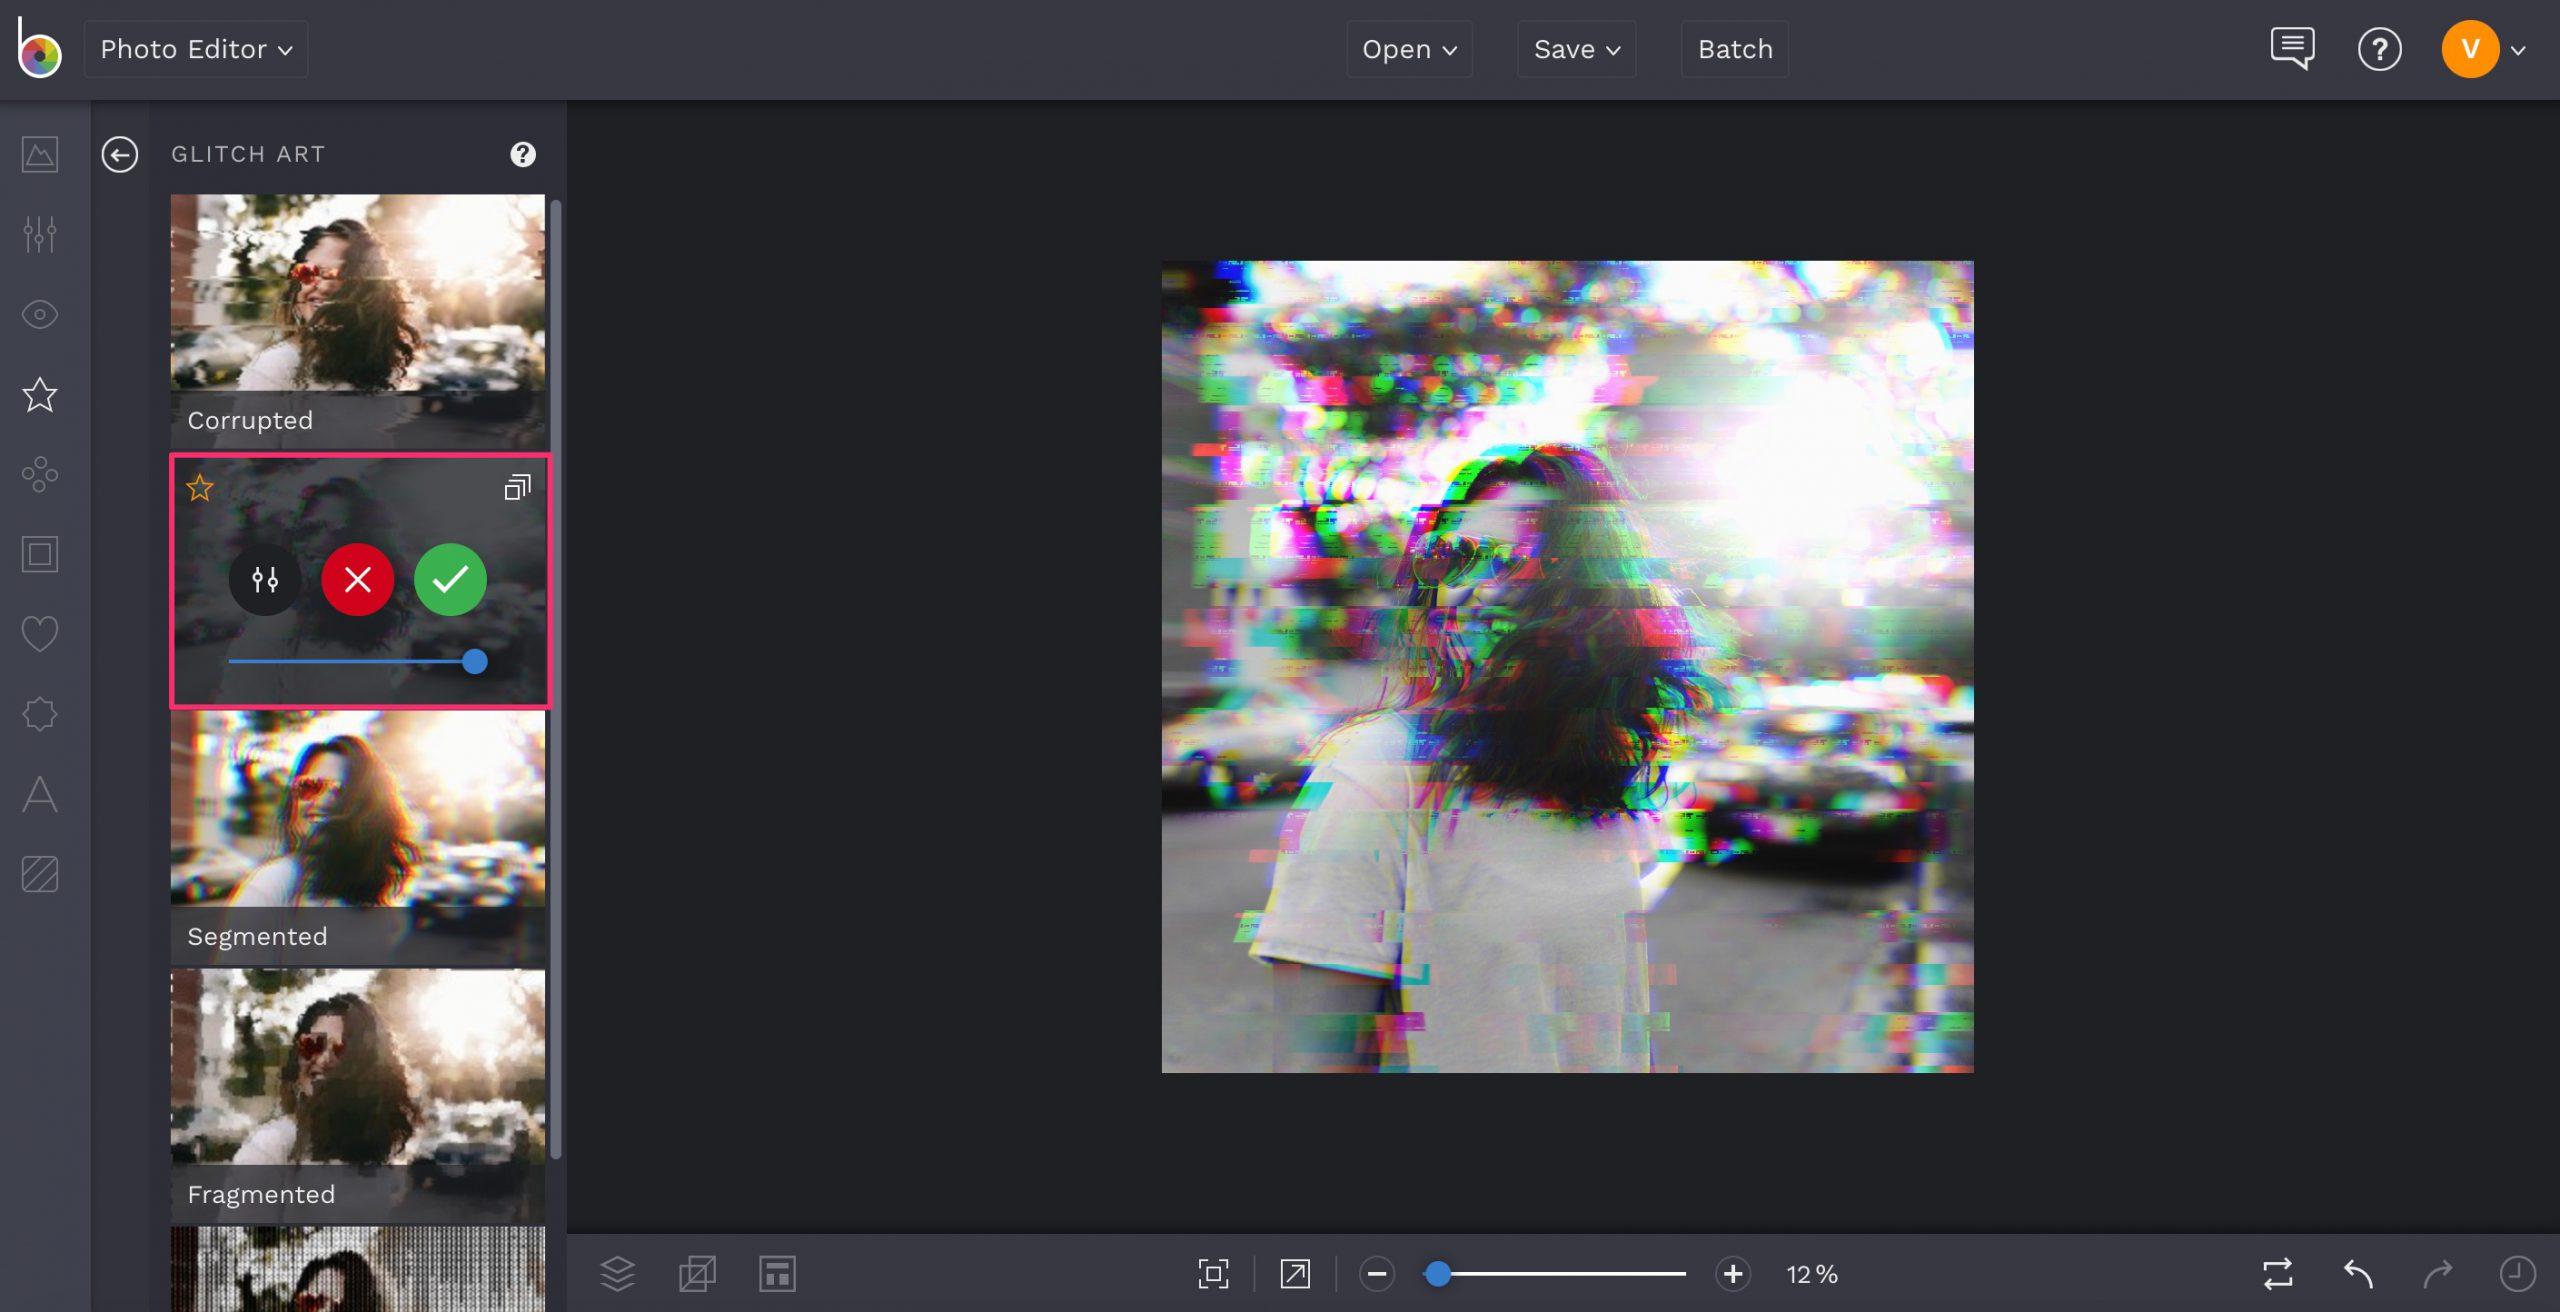 Online glitch art editor